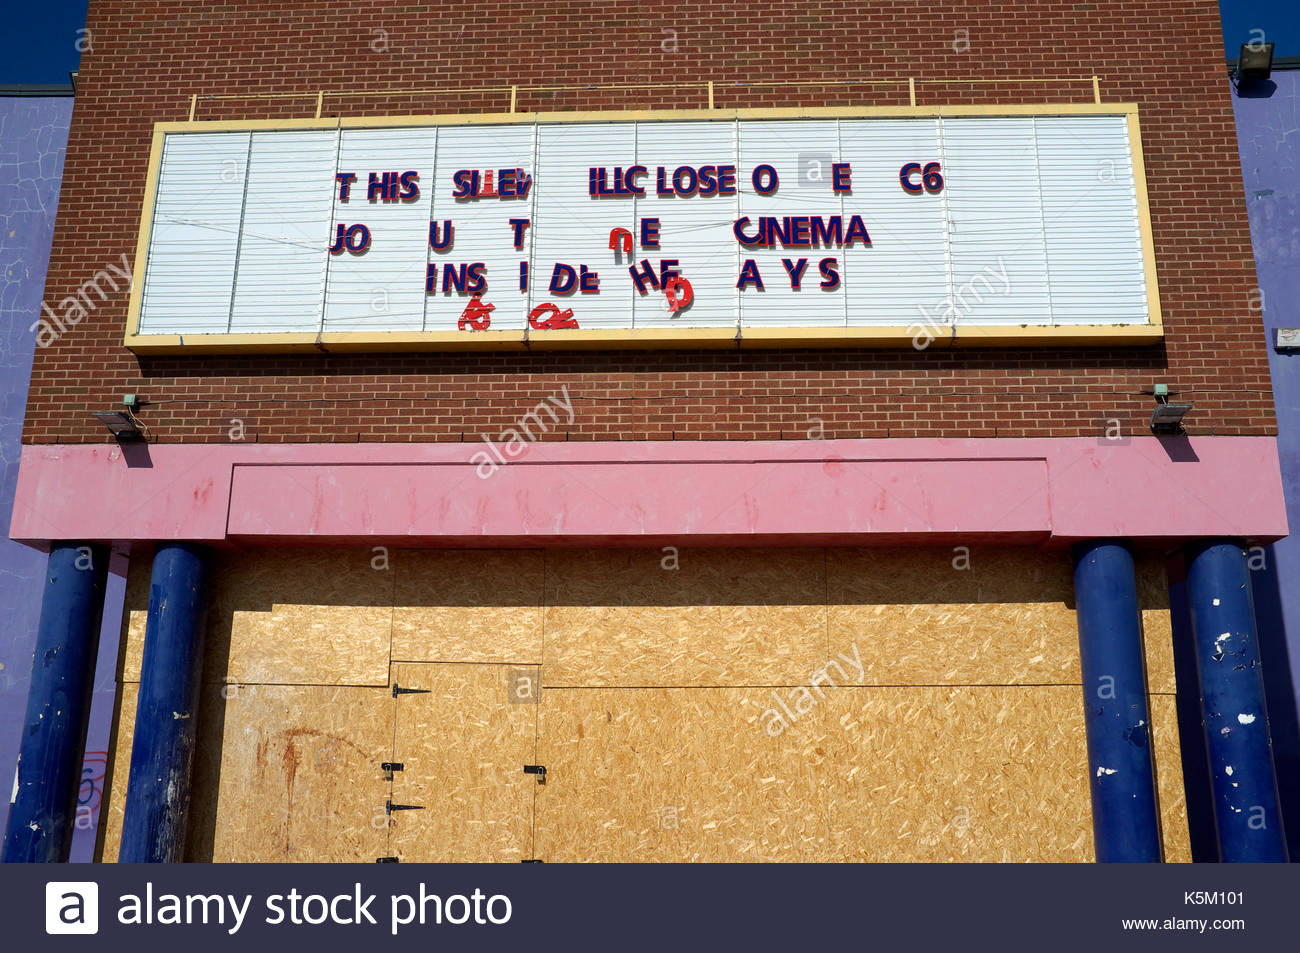 Un cinéma Cineworld fermé à la Peel-centre de Gloucester, Royaume-Uni. Photo Stock